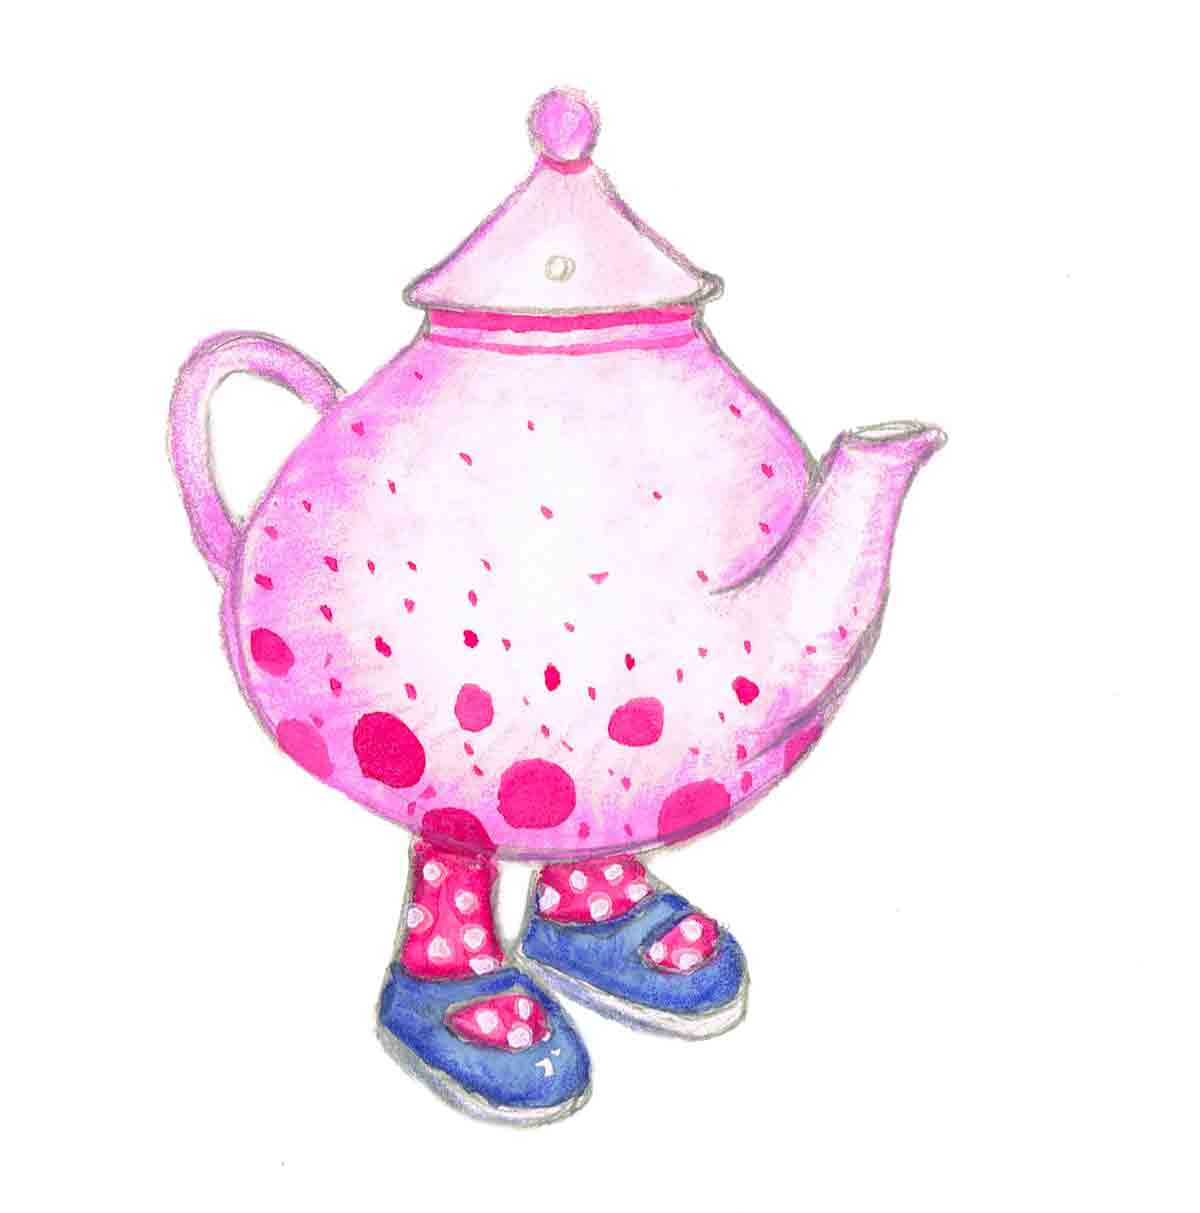 Tea-Time-No-5-teapot-with-feet-kw.jpg